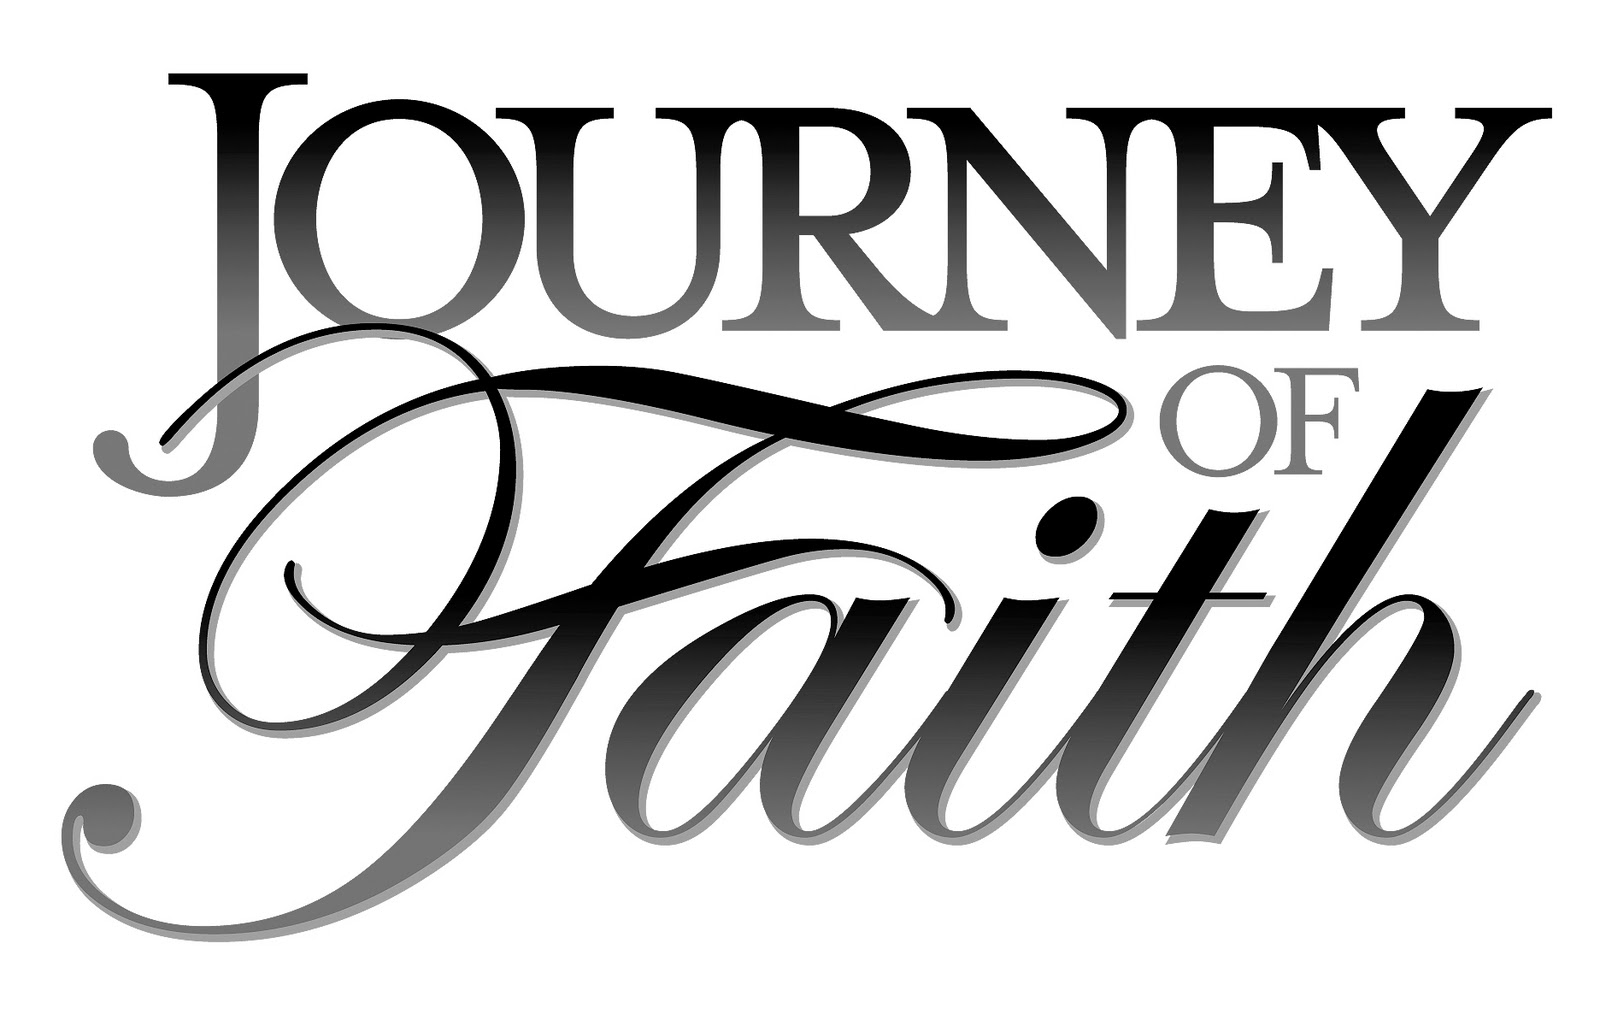 image journey of faith clip art title bw jpeg jpg the vampire rh vampirediaries wikia com